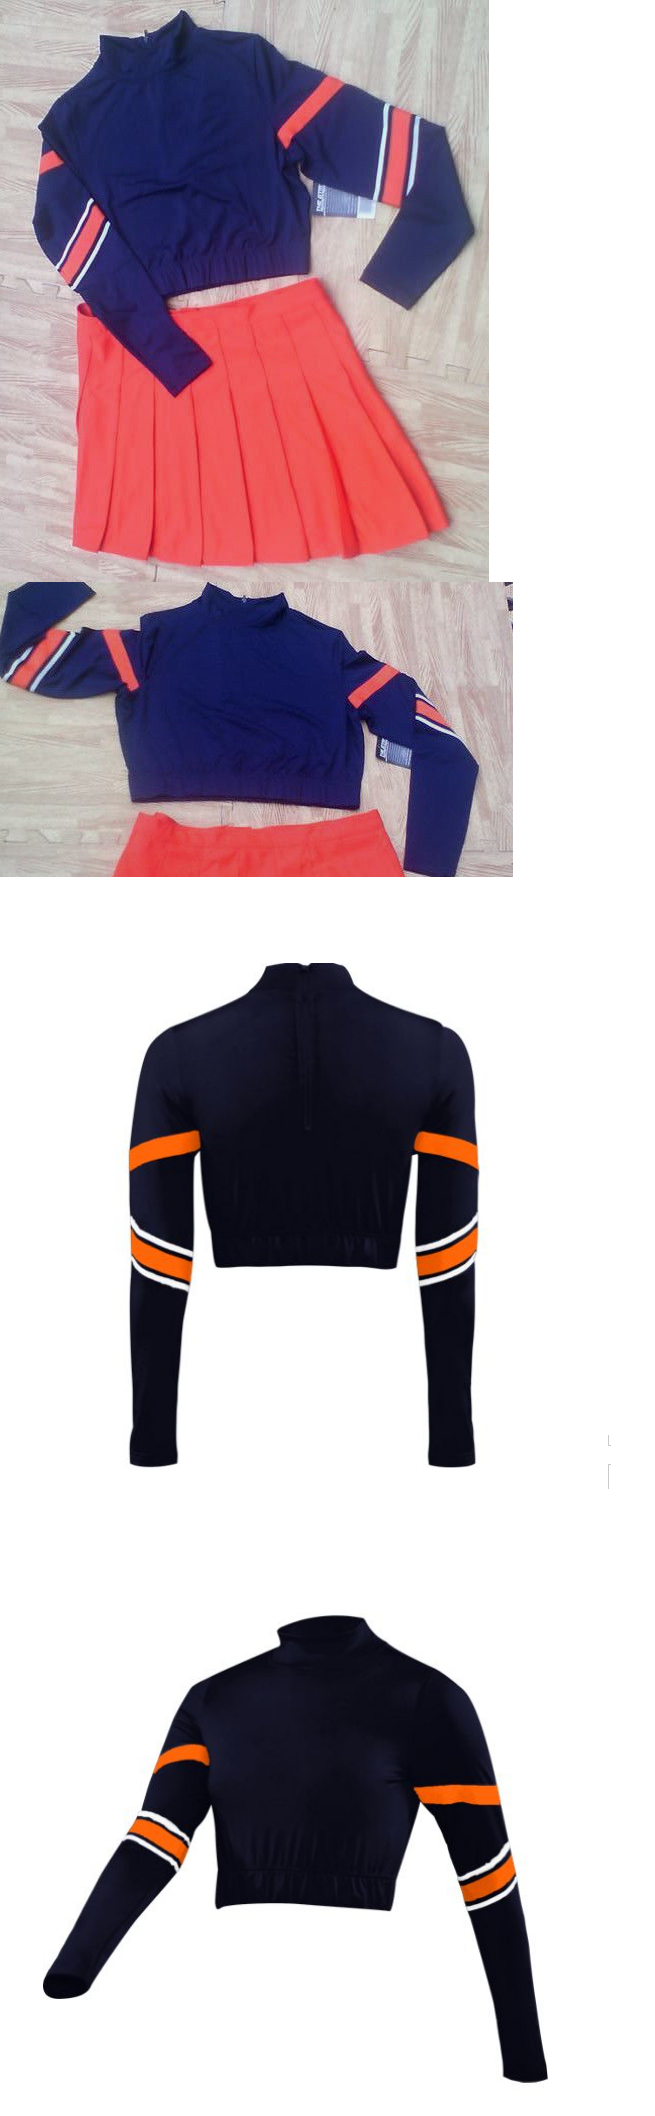 cf0954e5875 Cheerleading 66832  Adult Xl 16 18 Navy Orange Cheerleader Uniform Crop Top  Skirt 41-